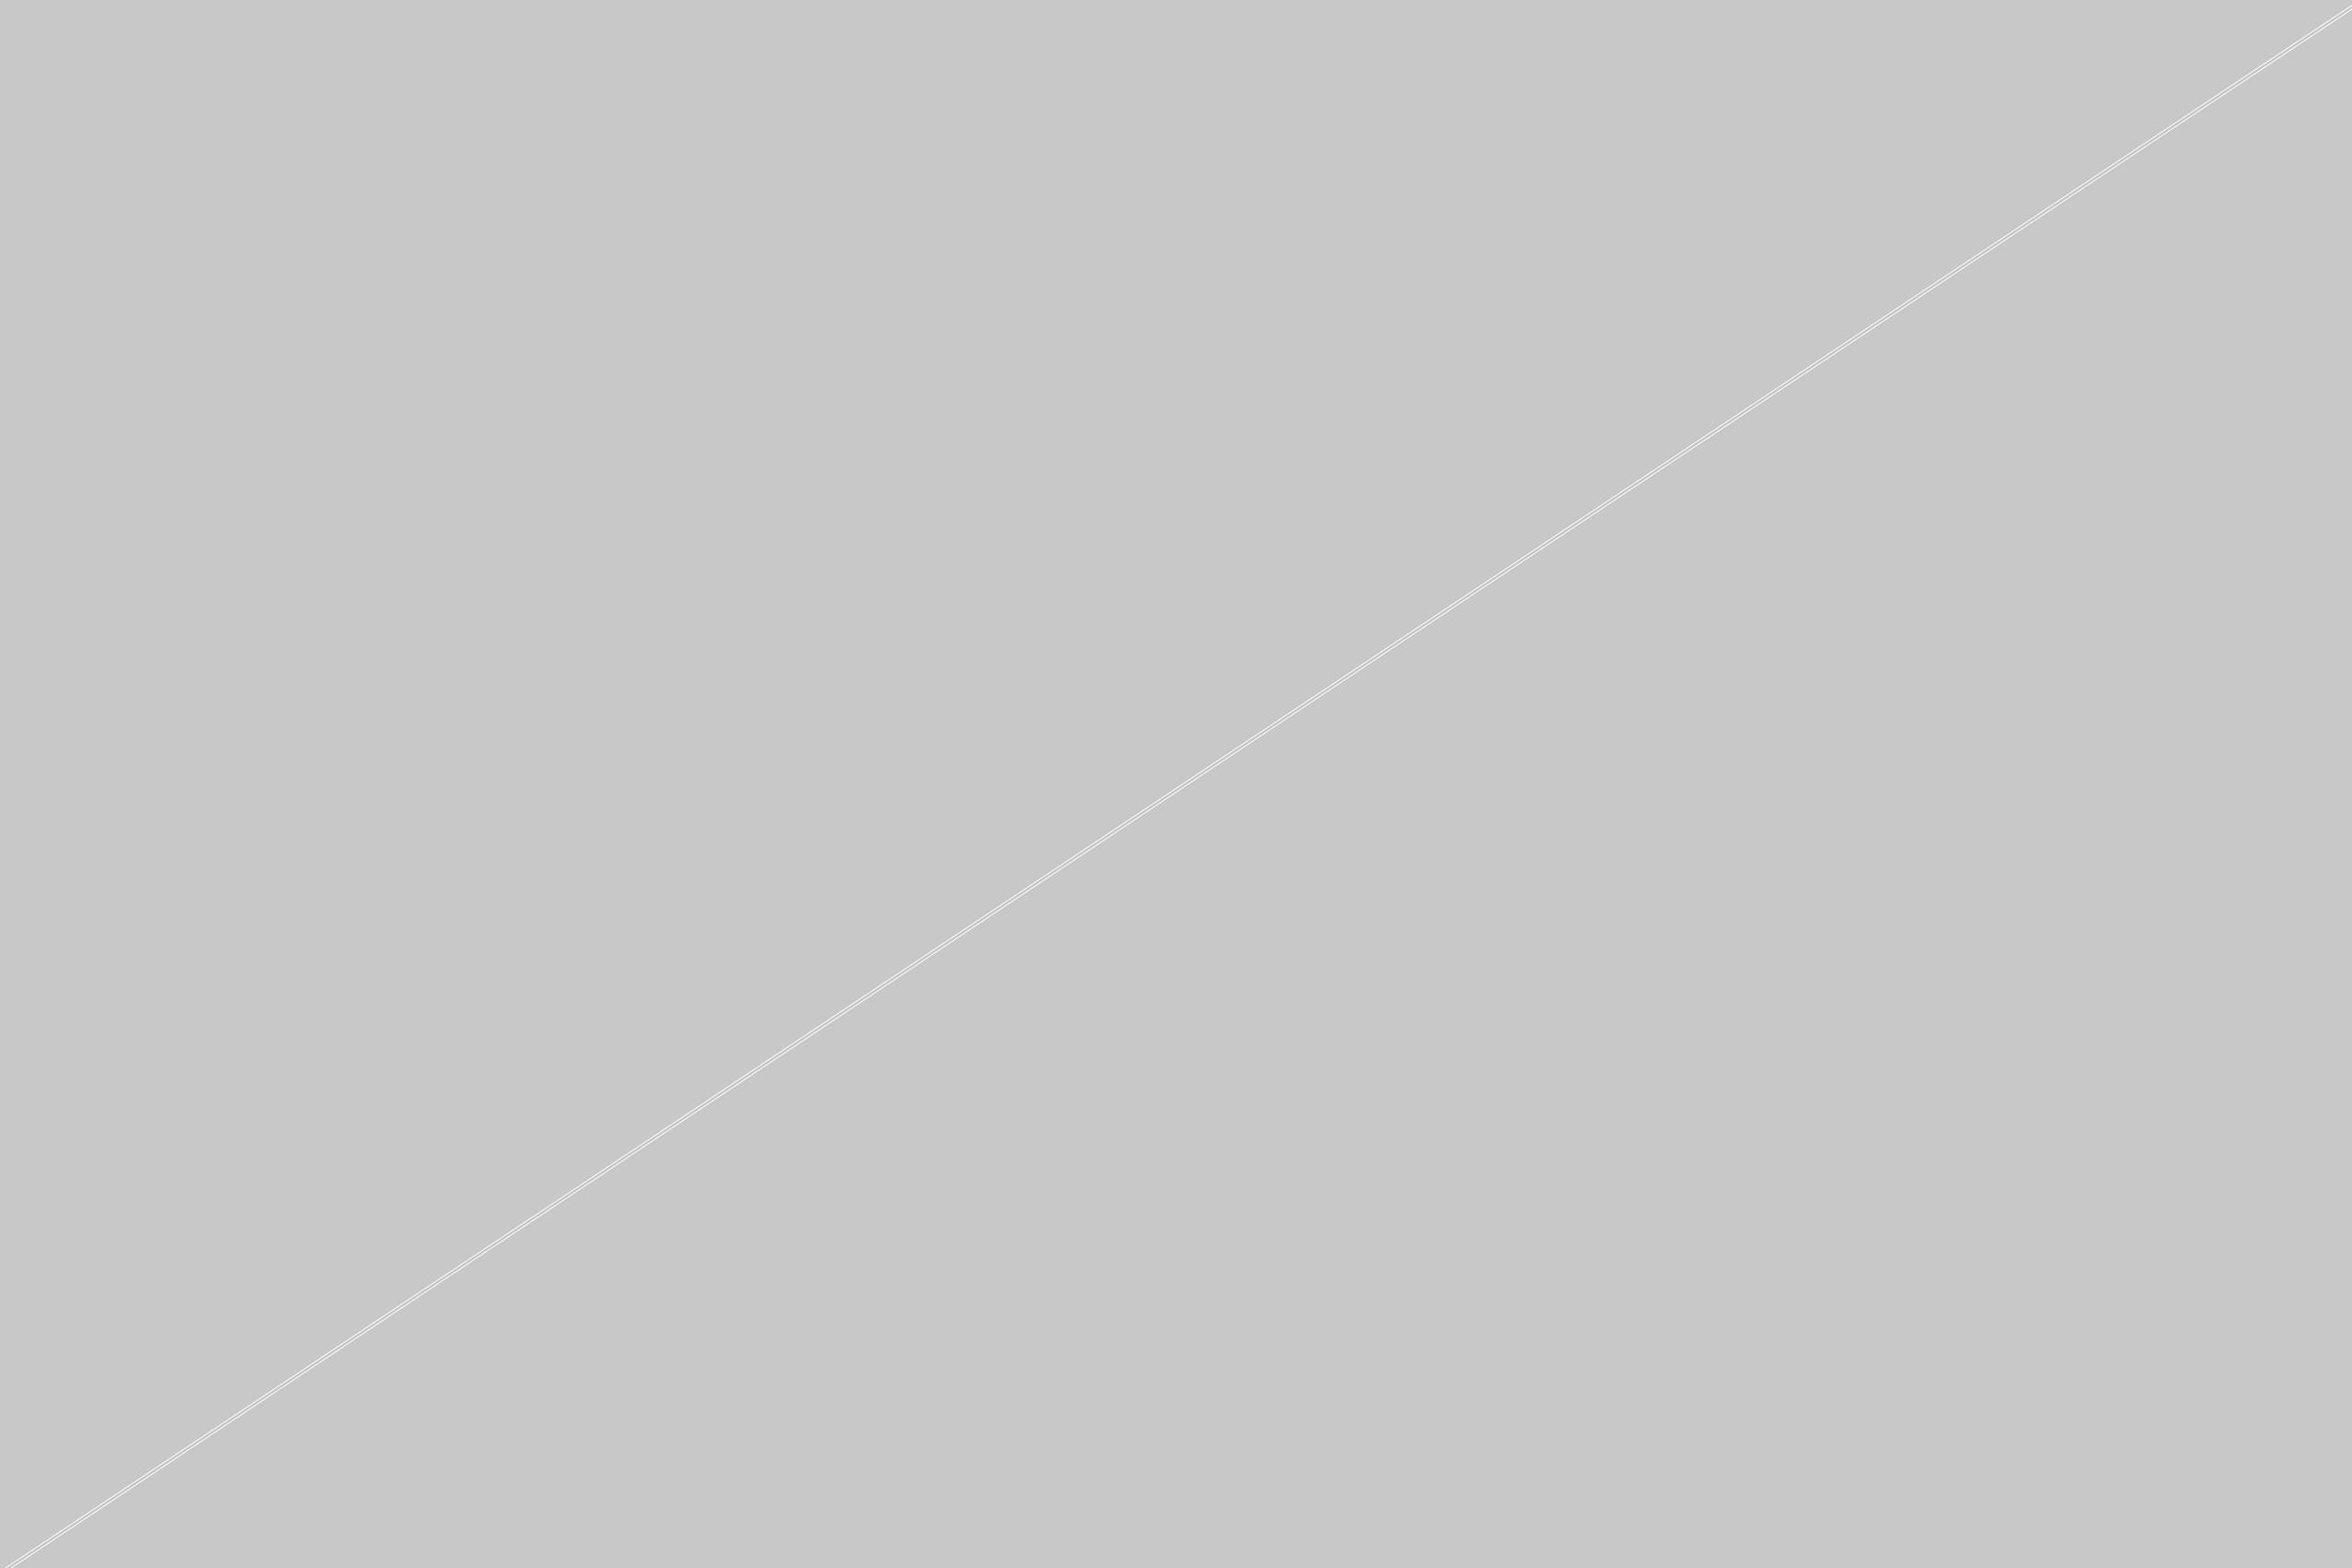 https://cpisalud.com.ar/wp-content/uploads/2018/02/grey-placeholder.jpg